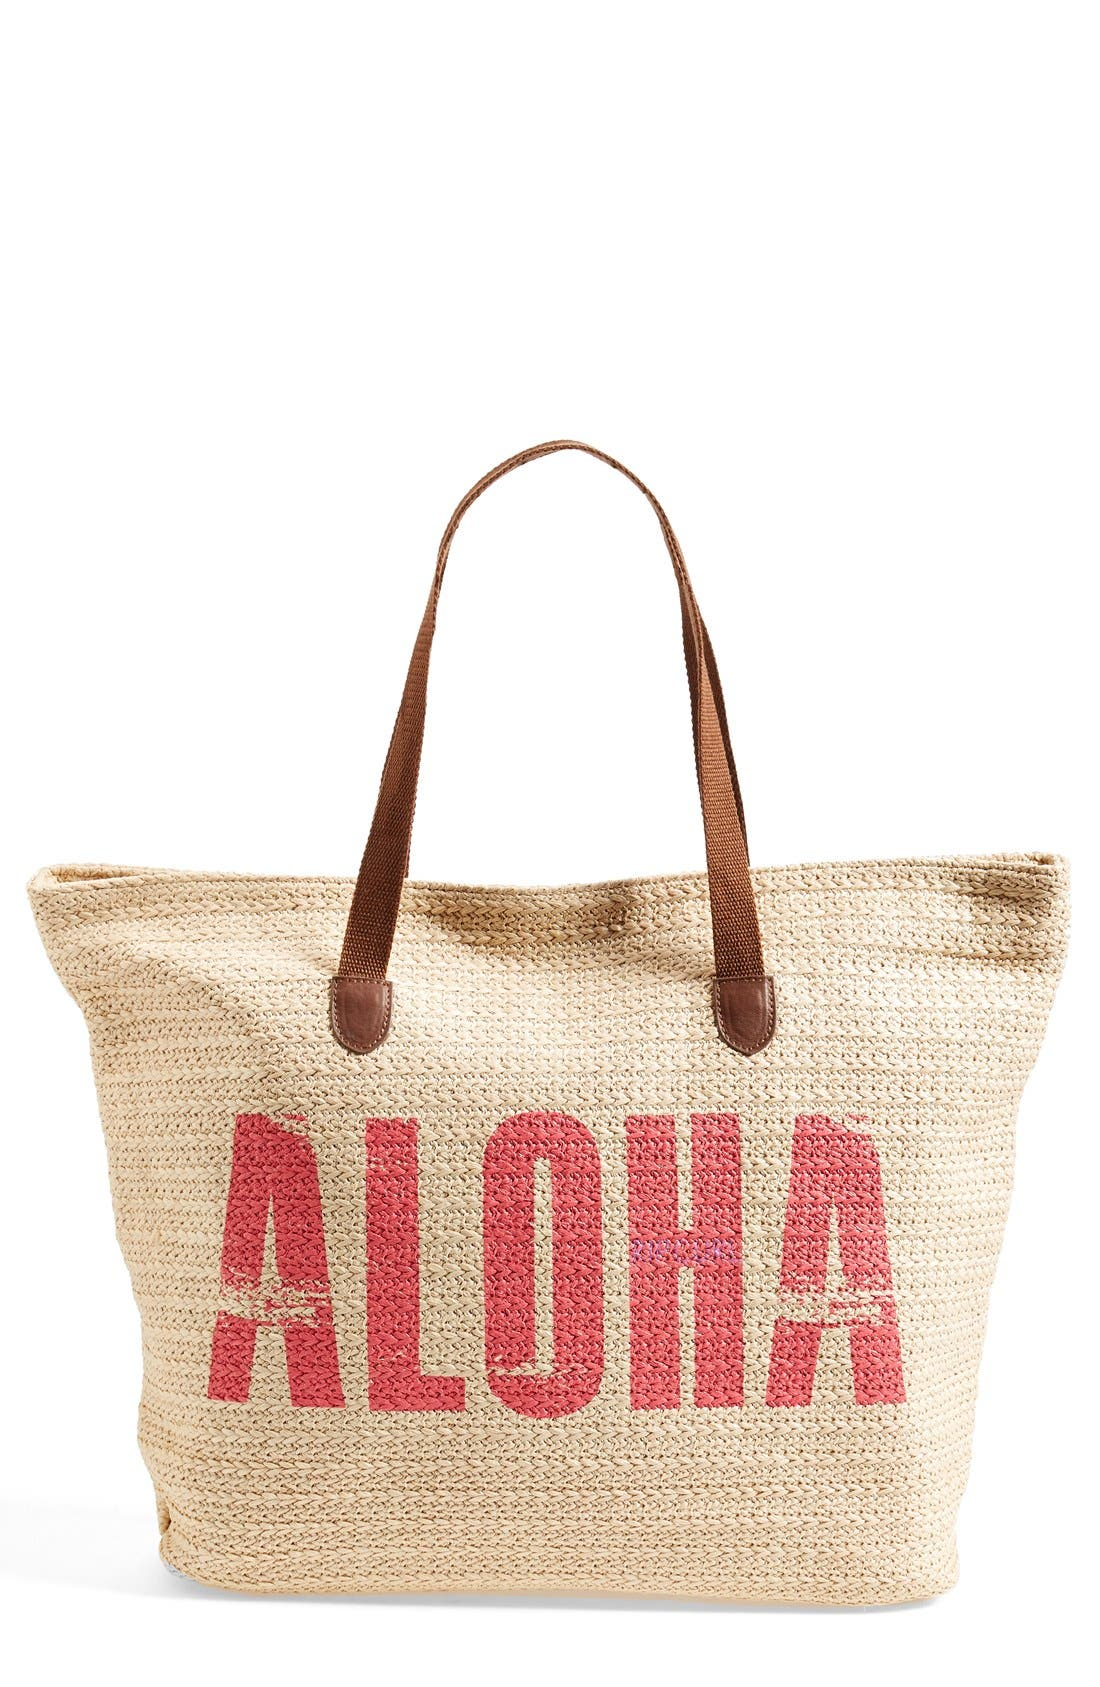 Alternate Image 1 Selected - Rip Curl 'Aloha' Beach Bag